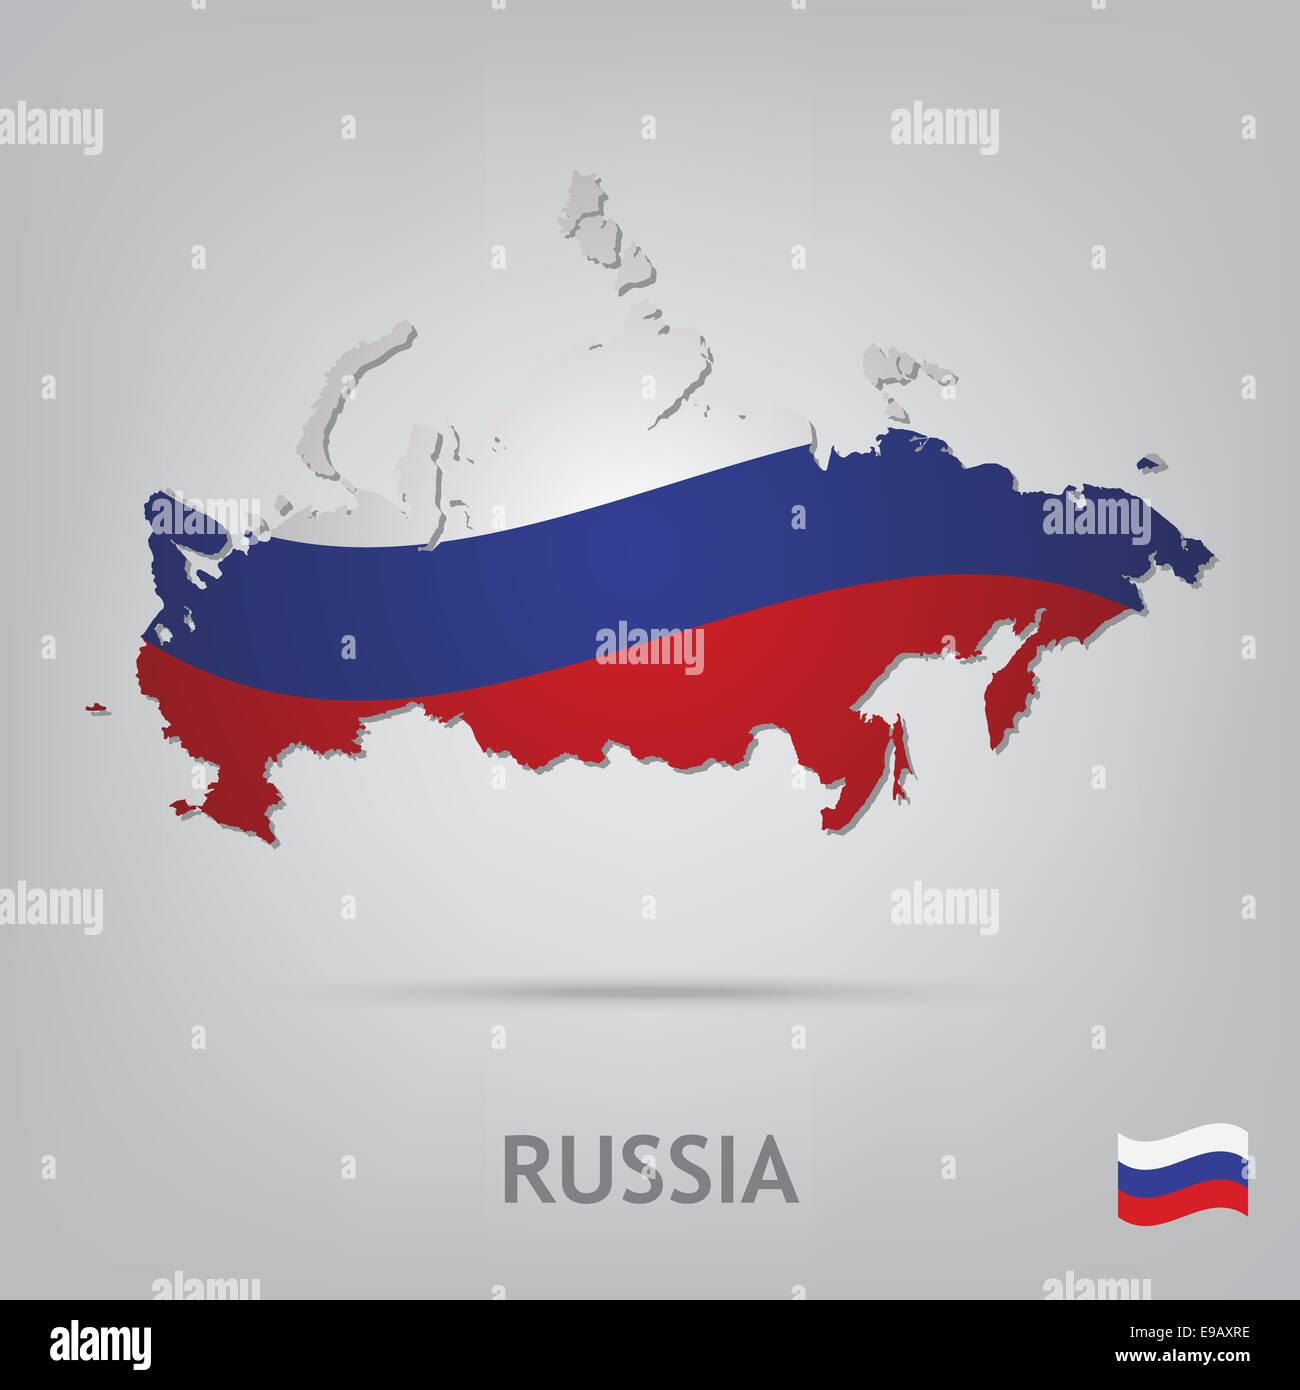 Russia - Stock Image